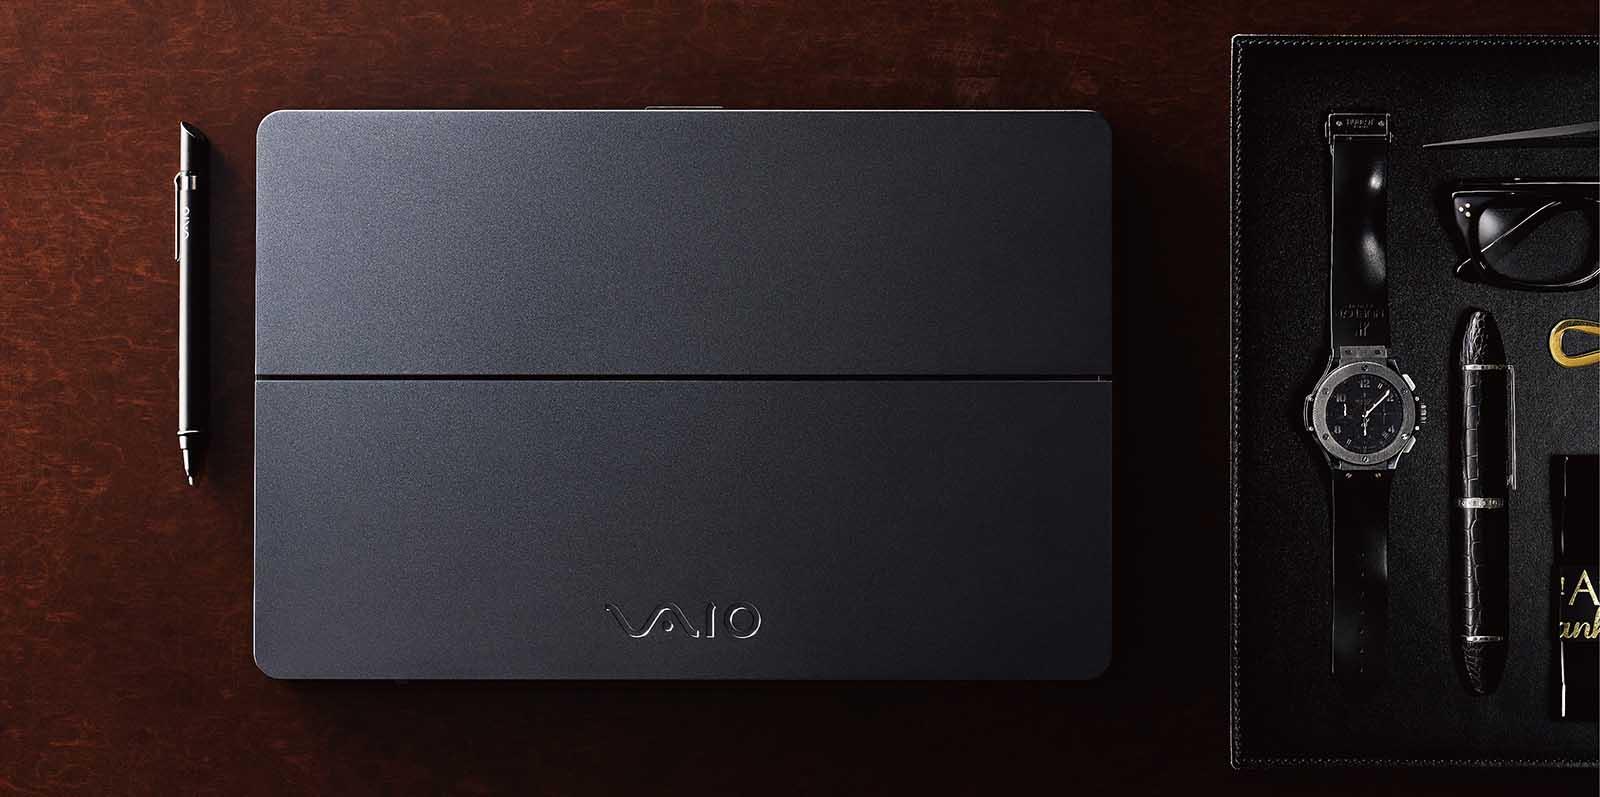 Vaio Pics, Technology Collection